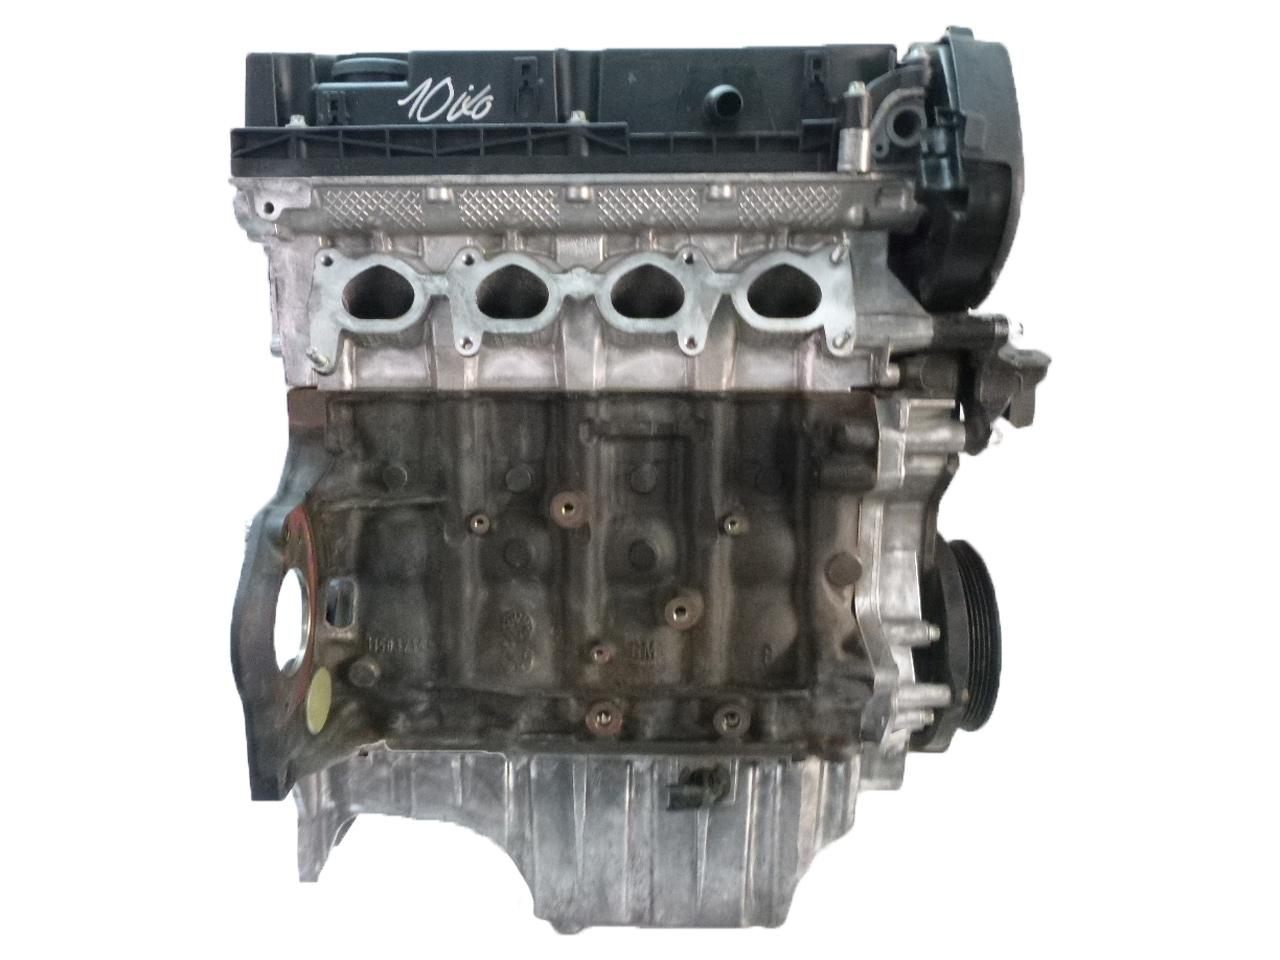 Motor Opel Corsa D E 1,6 Turbo VXR B16LER